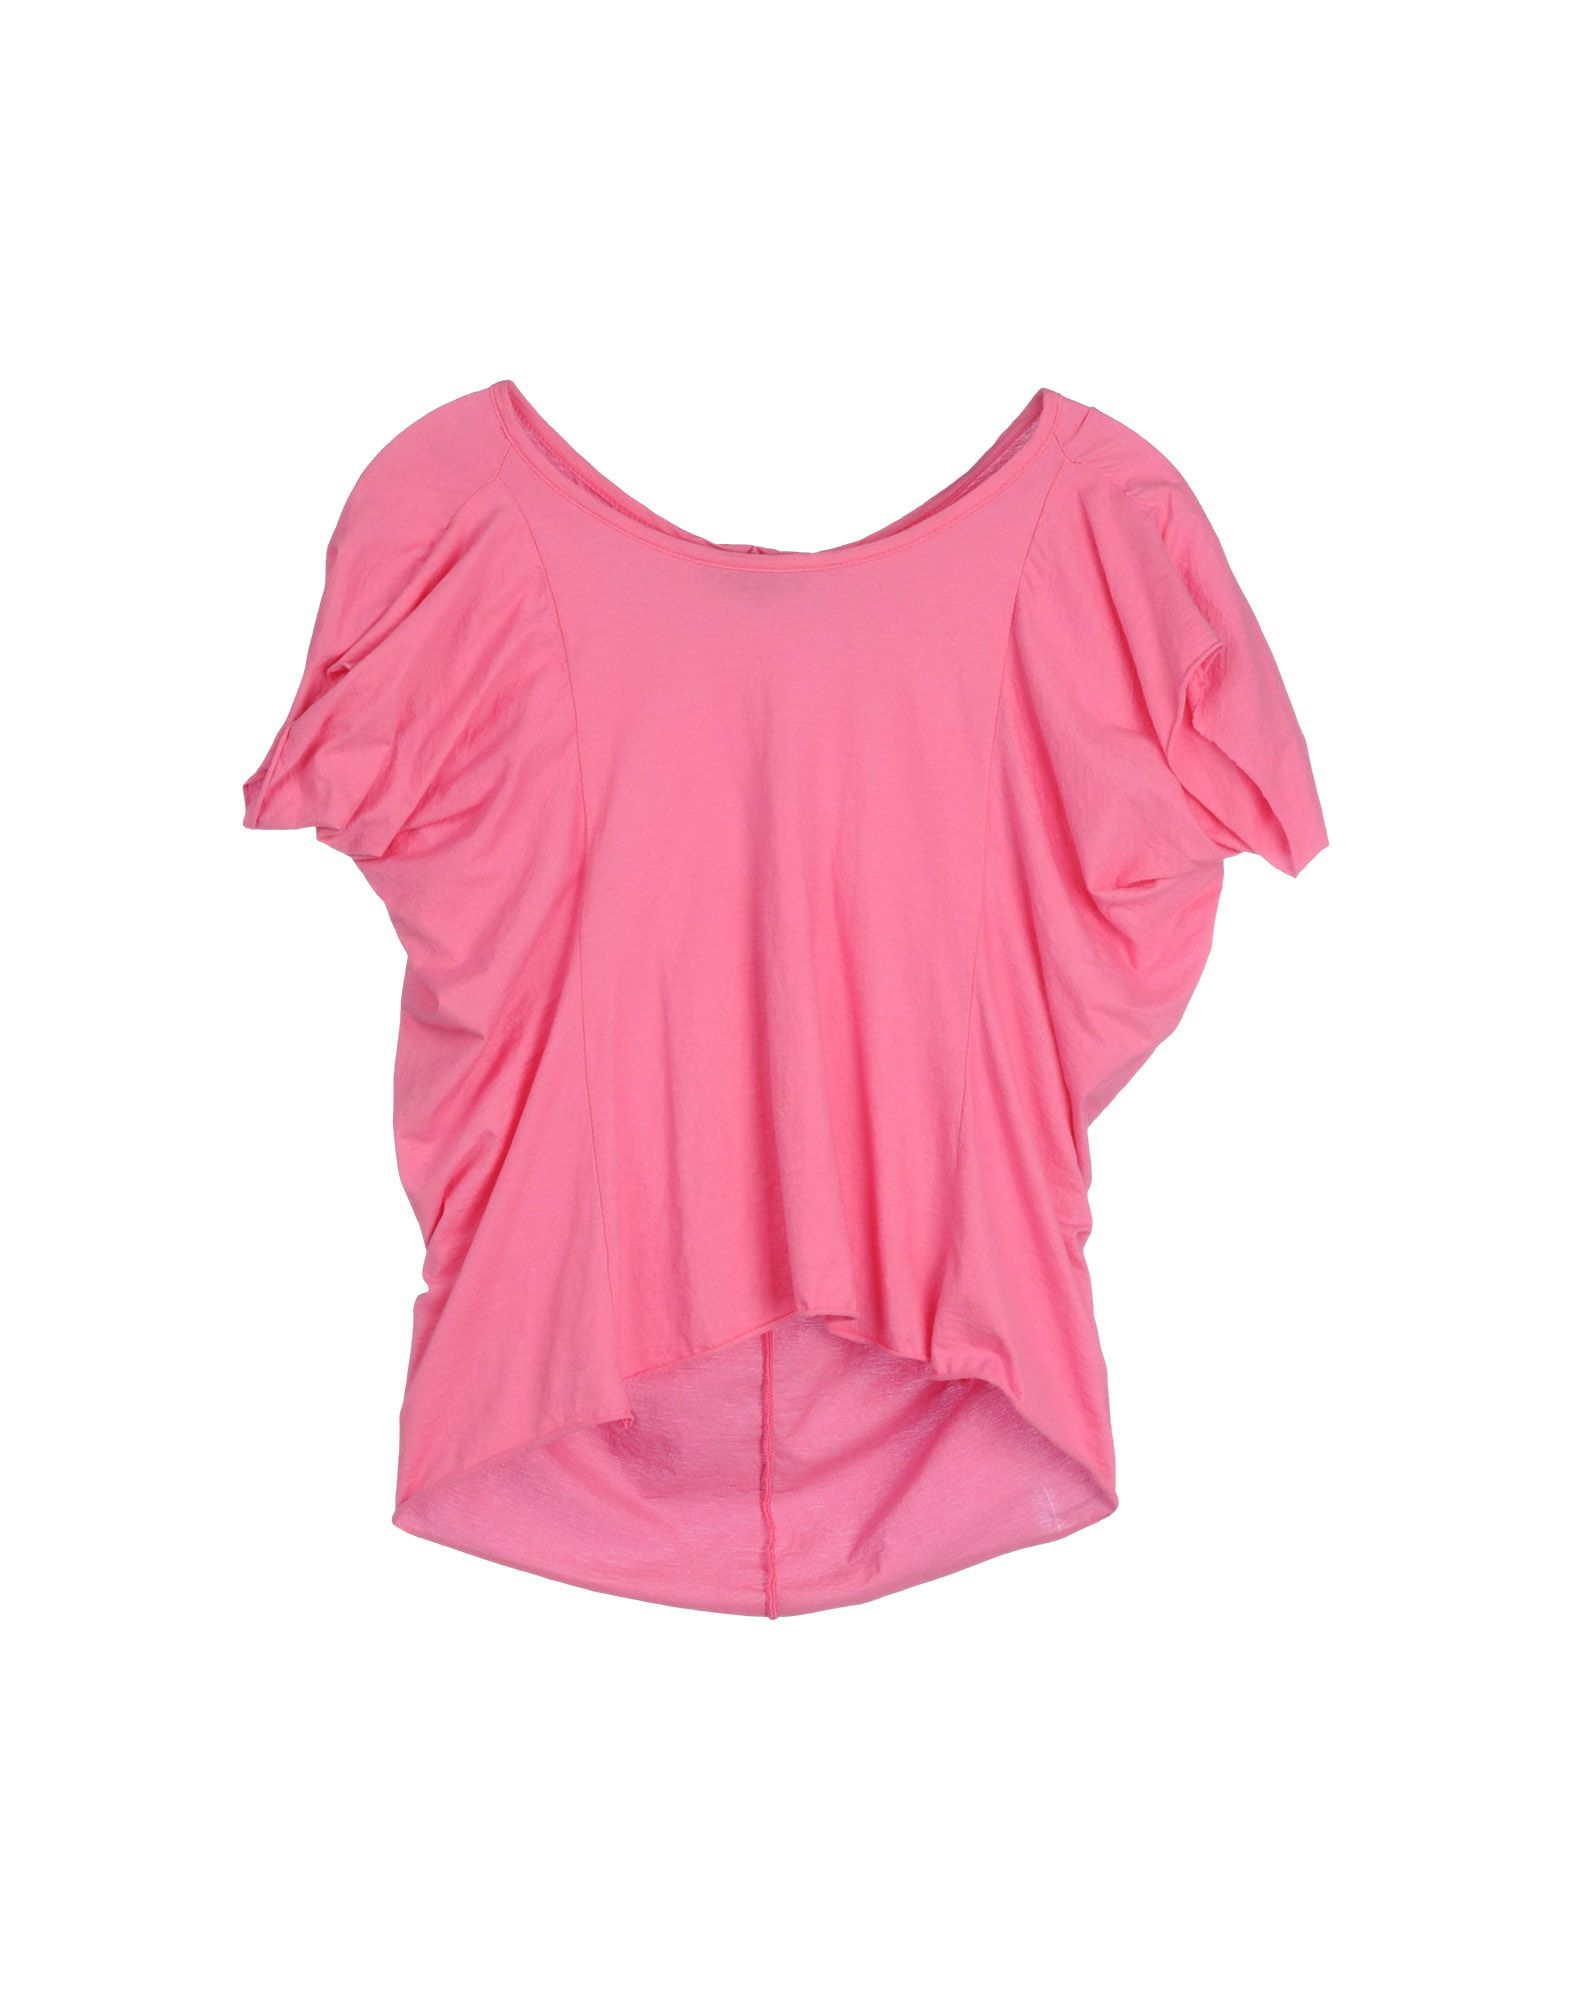 ADELE FADO Short sleeve t-shirts